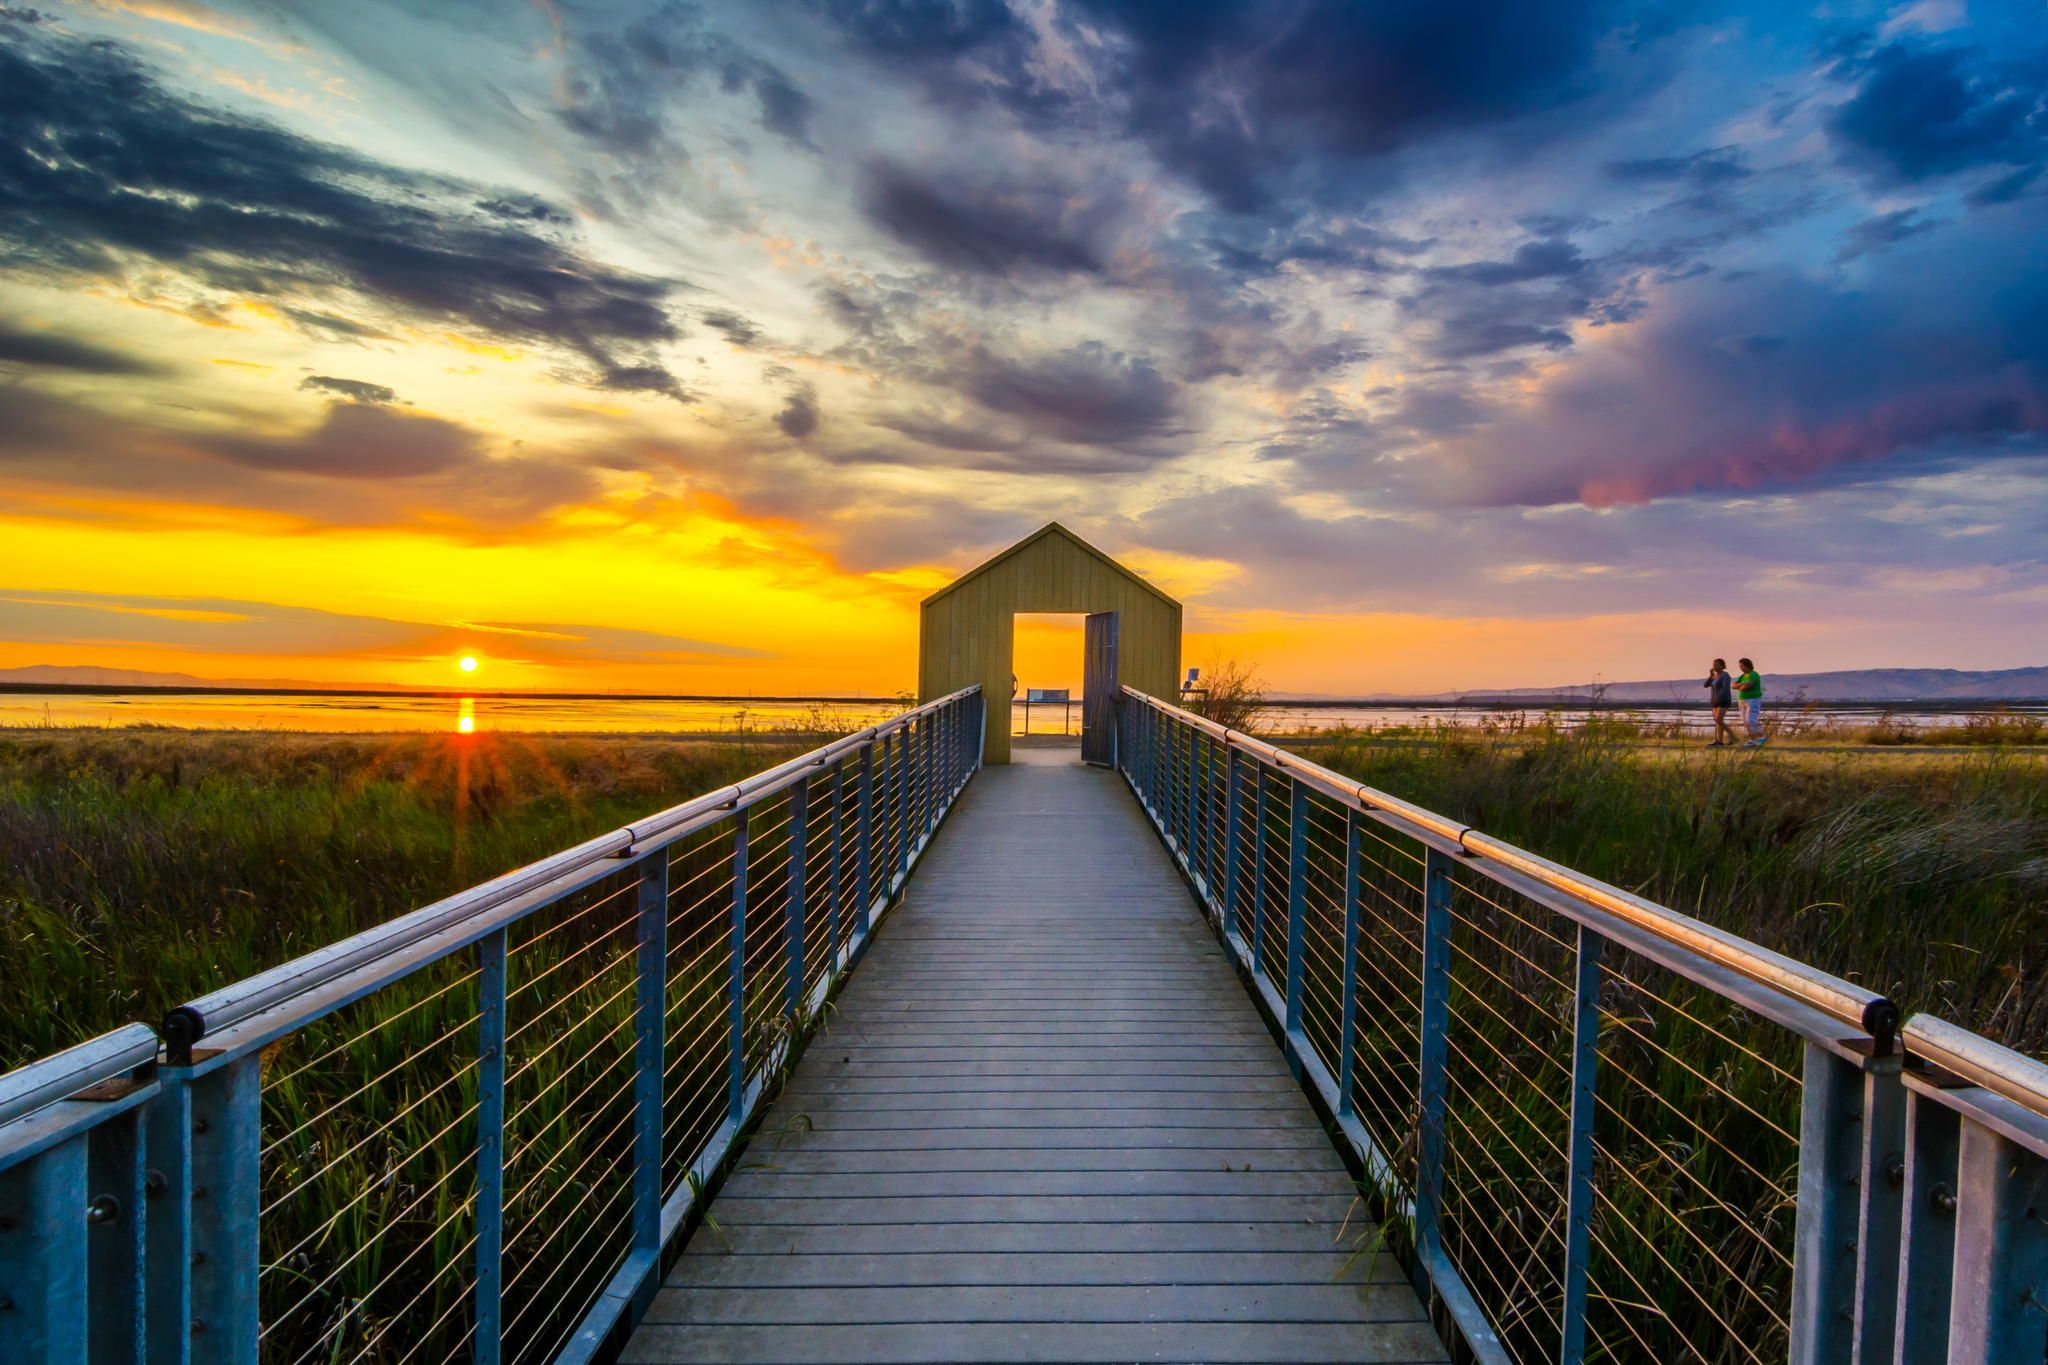 Sunset colors on Alviso Marina County Park   County park, Sunset colors, Park